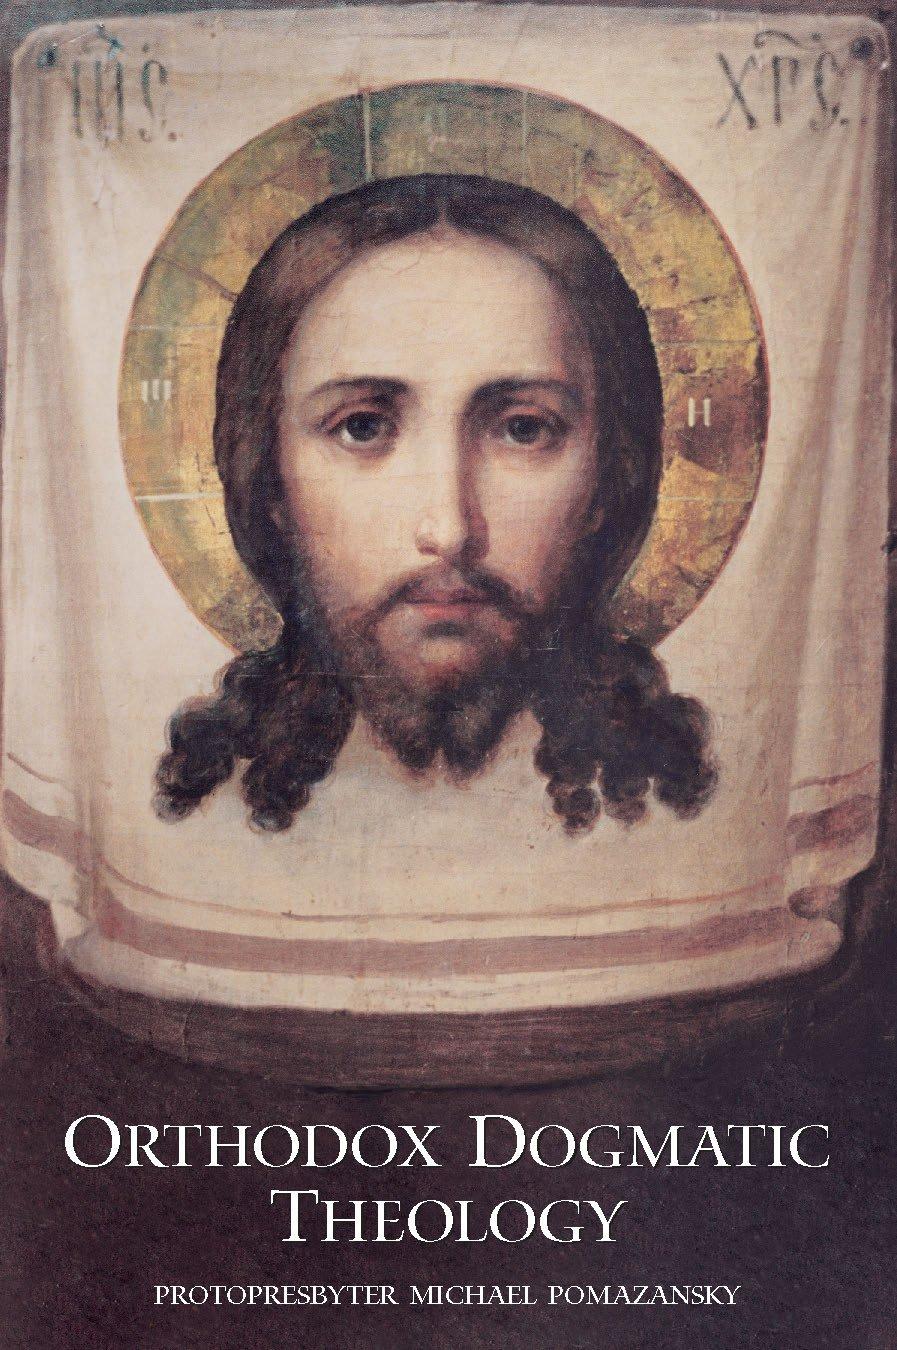 Image result for Pomazansky dogmatic orthodox theology